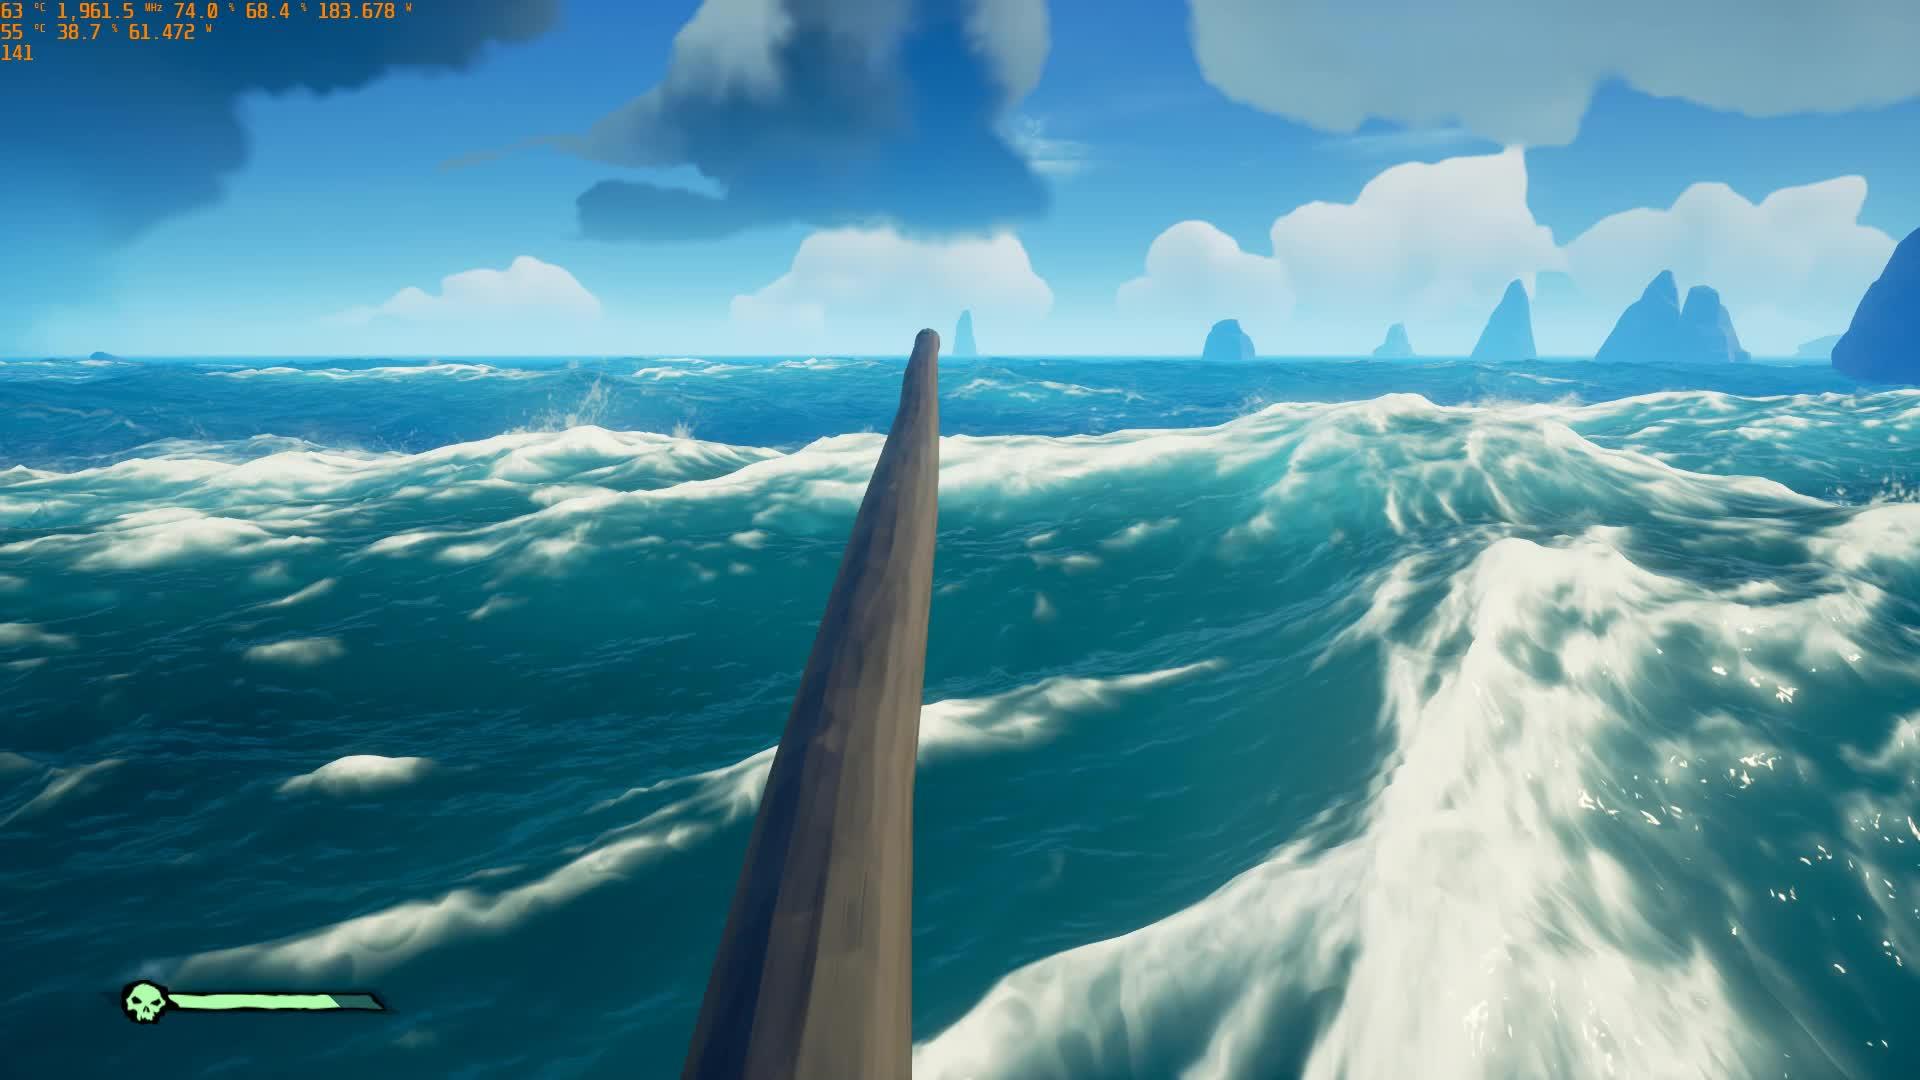 seaofthieves, Sea of Thieves 2018.08.01 - 00.05.39.07.DVR GIFs